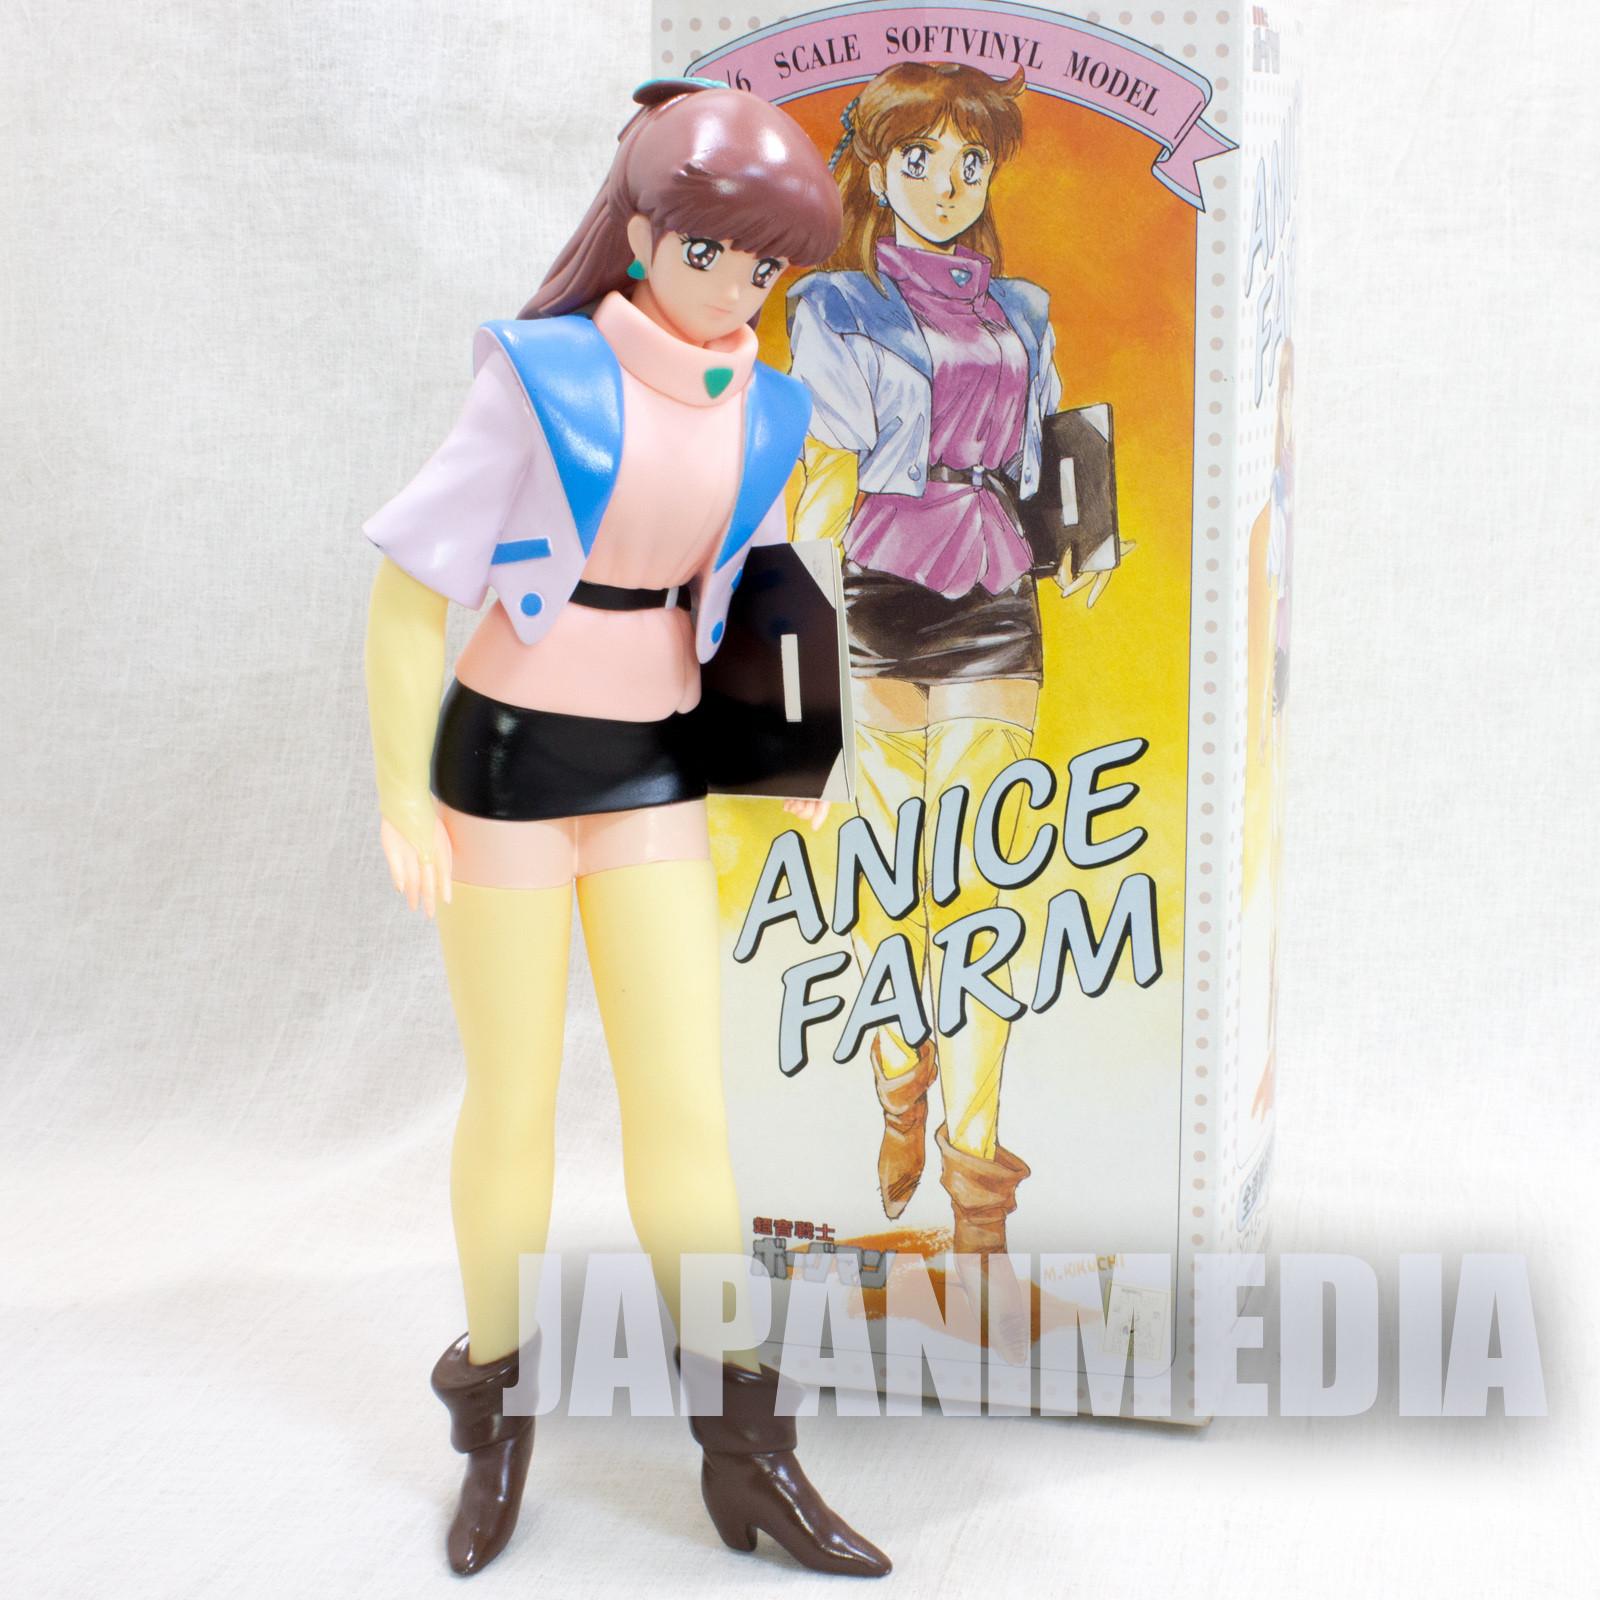 RARE Sonic Soldier Borgman Anice Farm Soft Vinyl Figure 1/6 Scale Musasiya